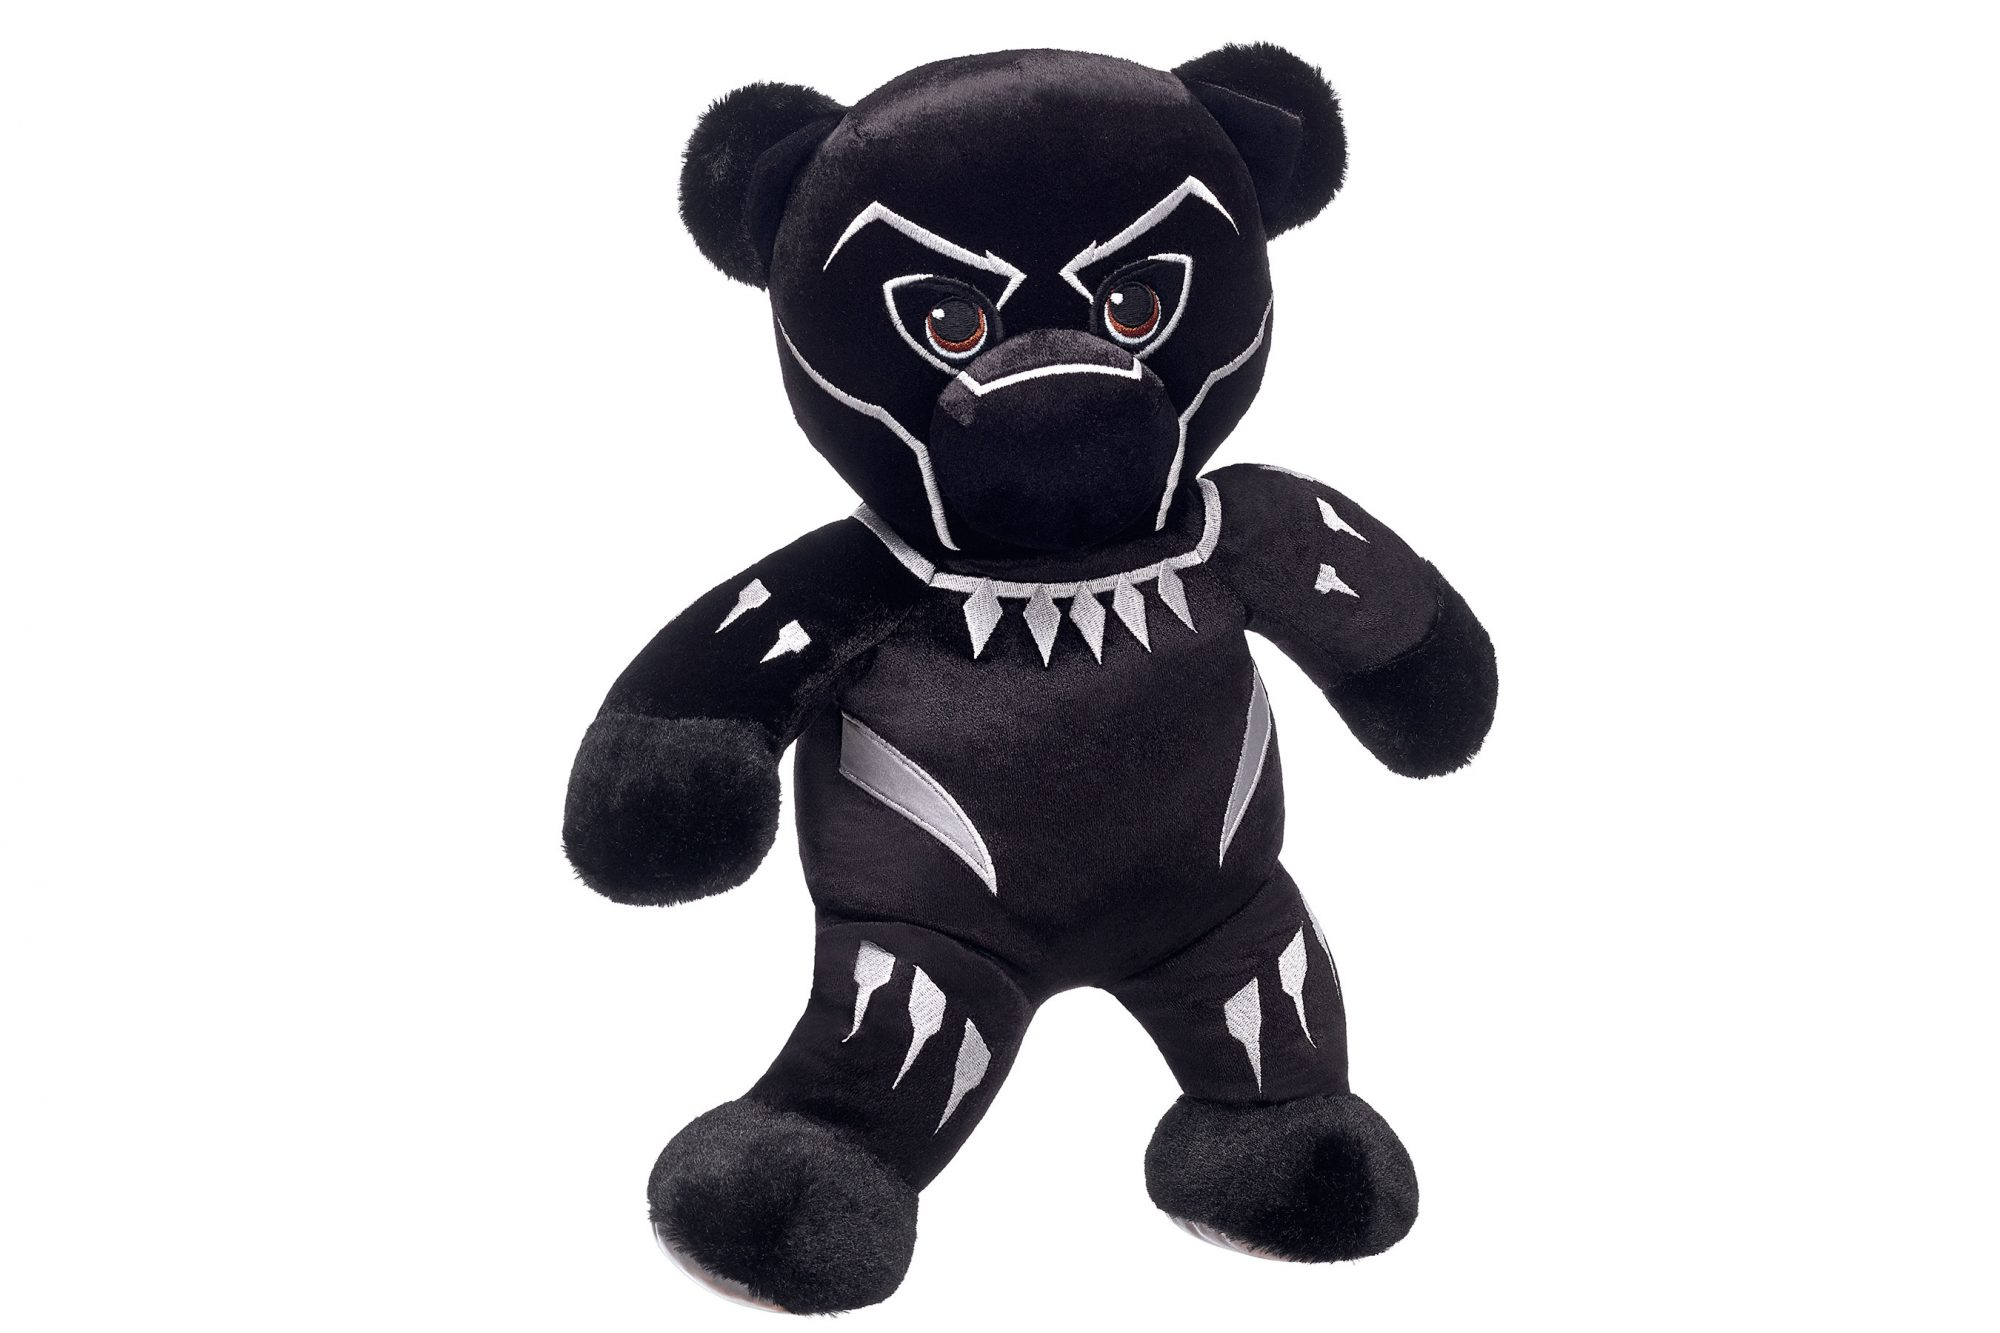 25831-25863 Black Panter Bear Posed